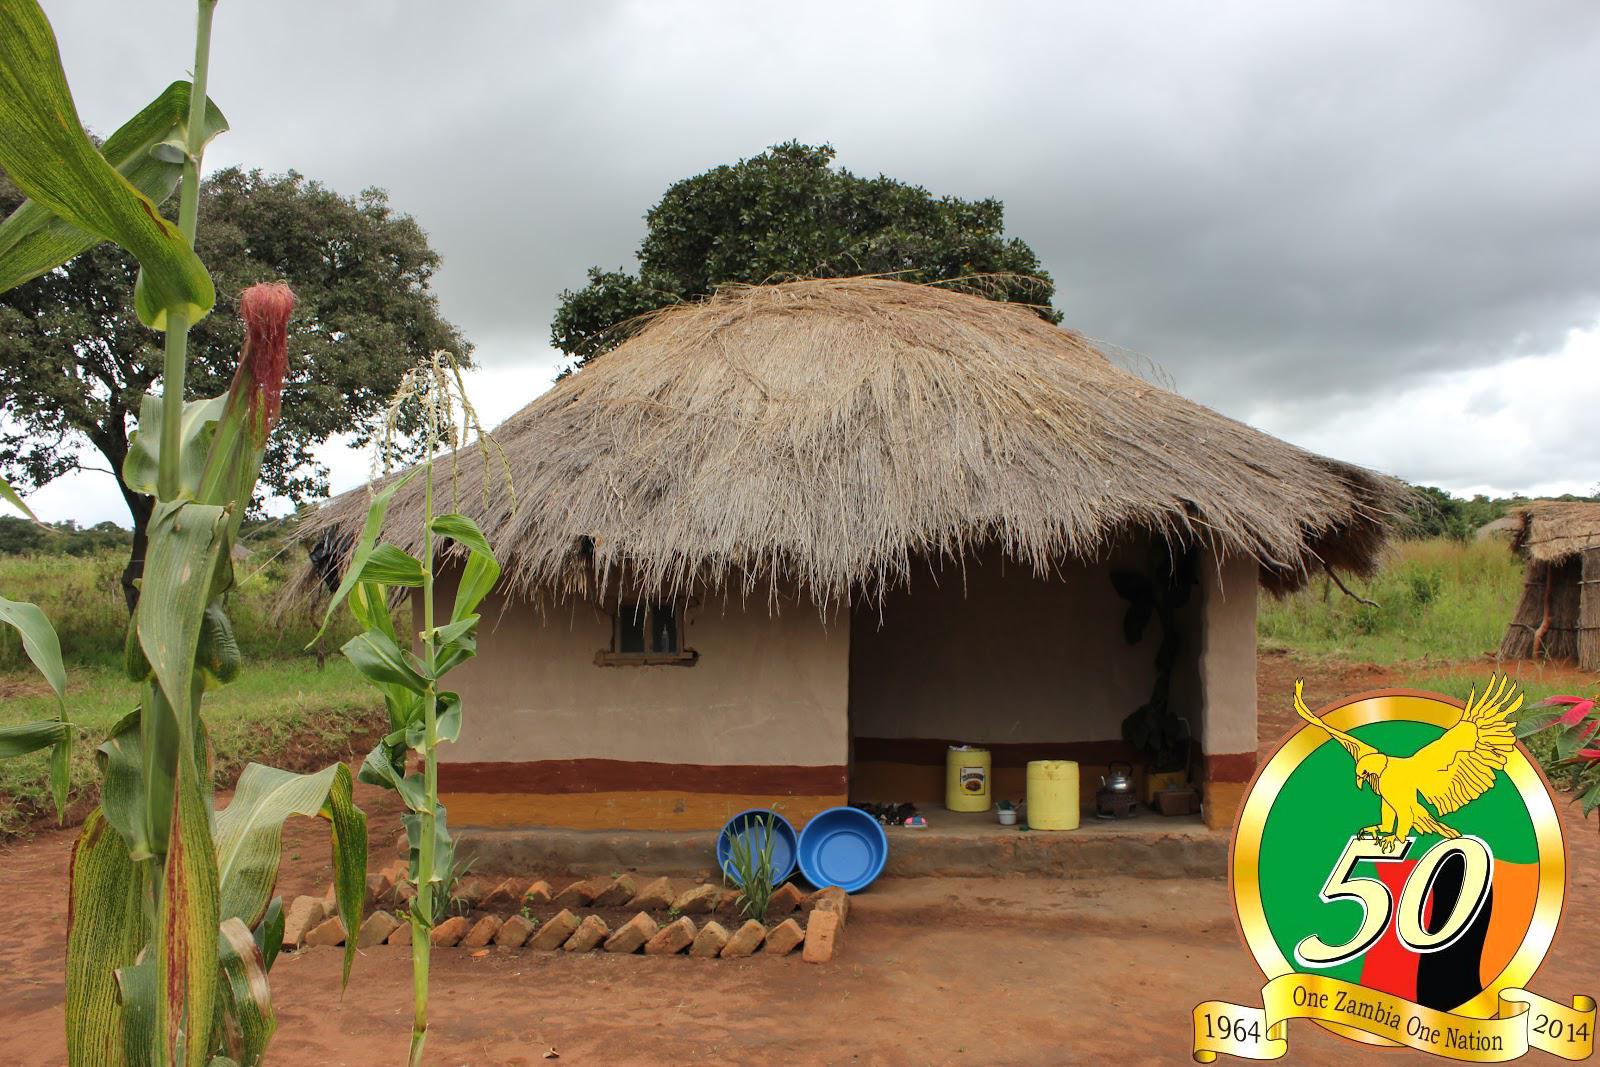 Peace Corps Volunteer Zambia